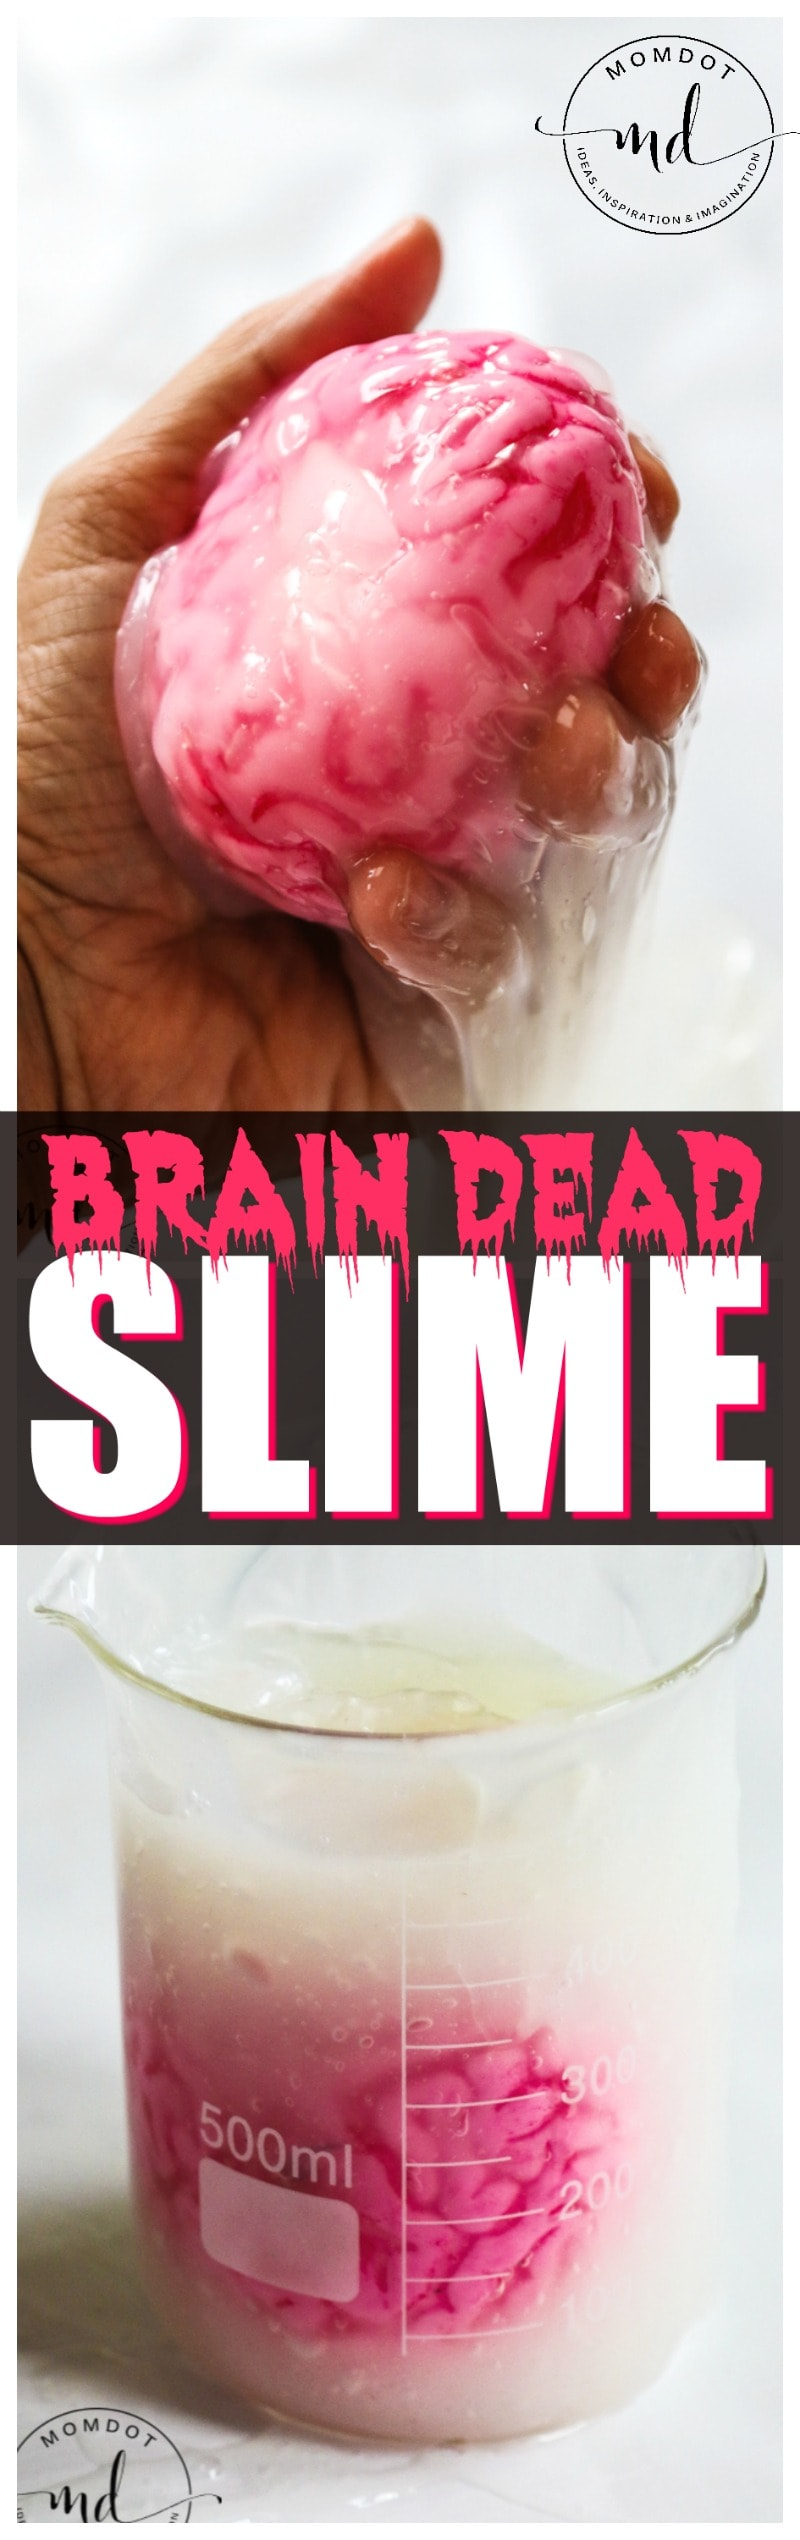 Brain Dead Slime : How to make FREAKY Halloween Slime   Halloween Decor